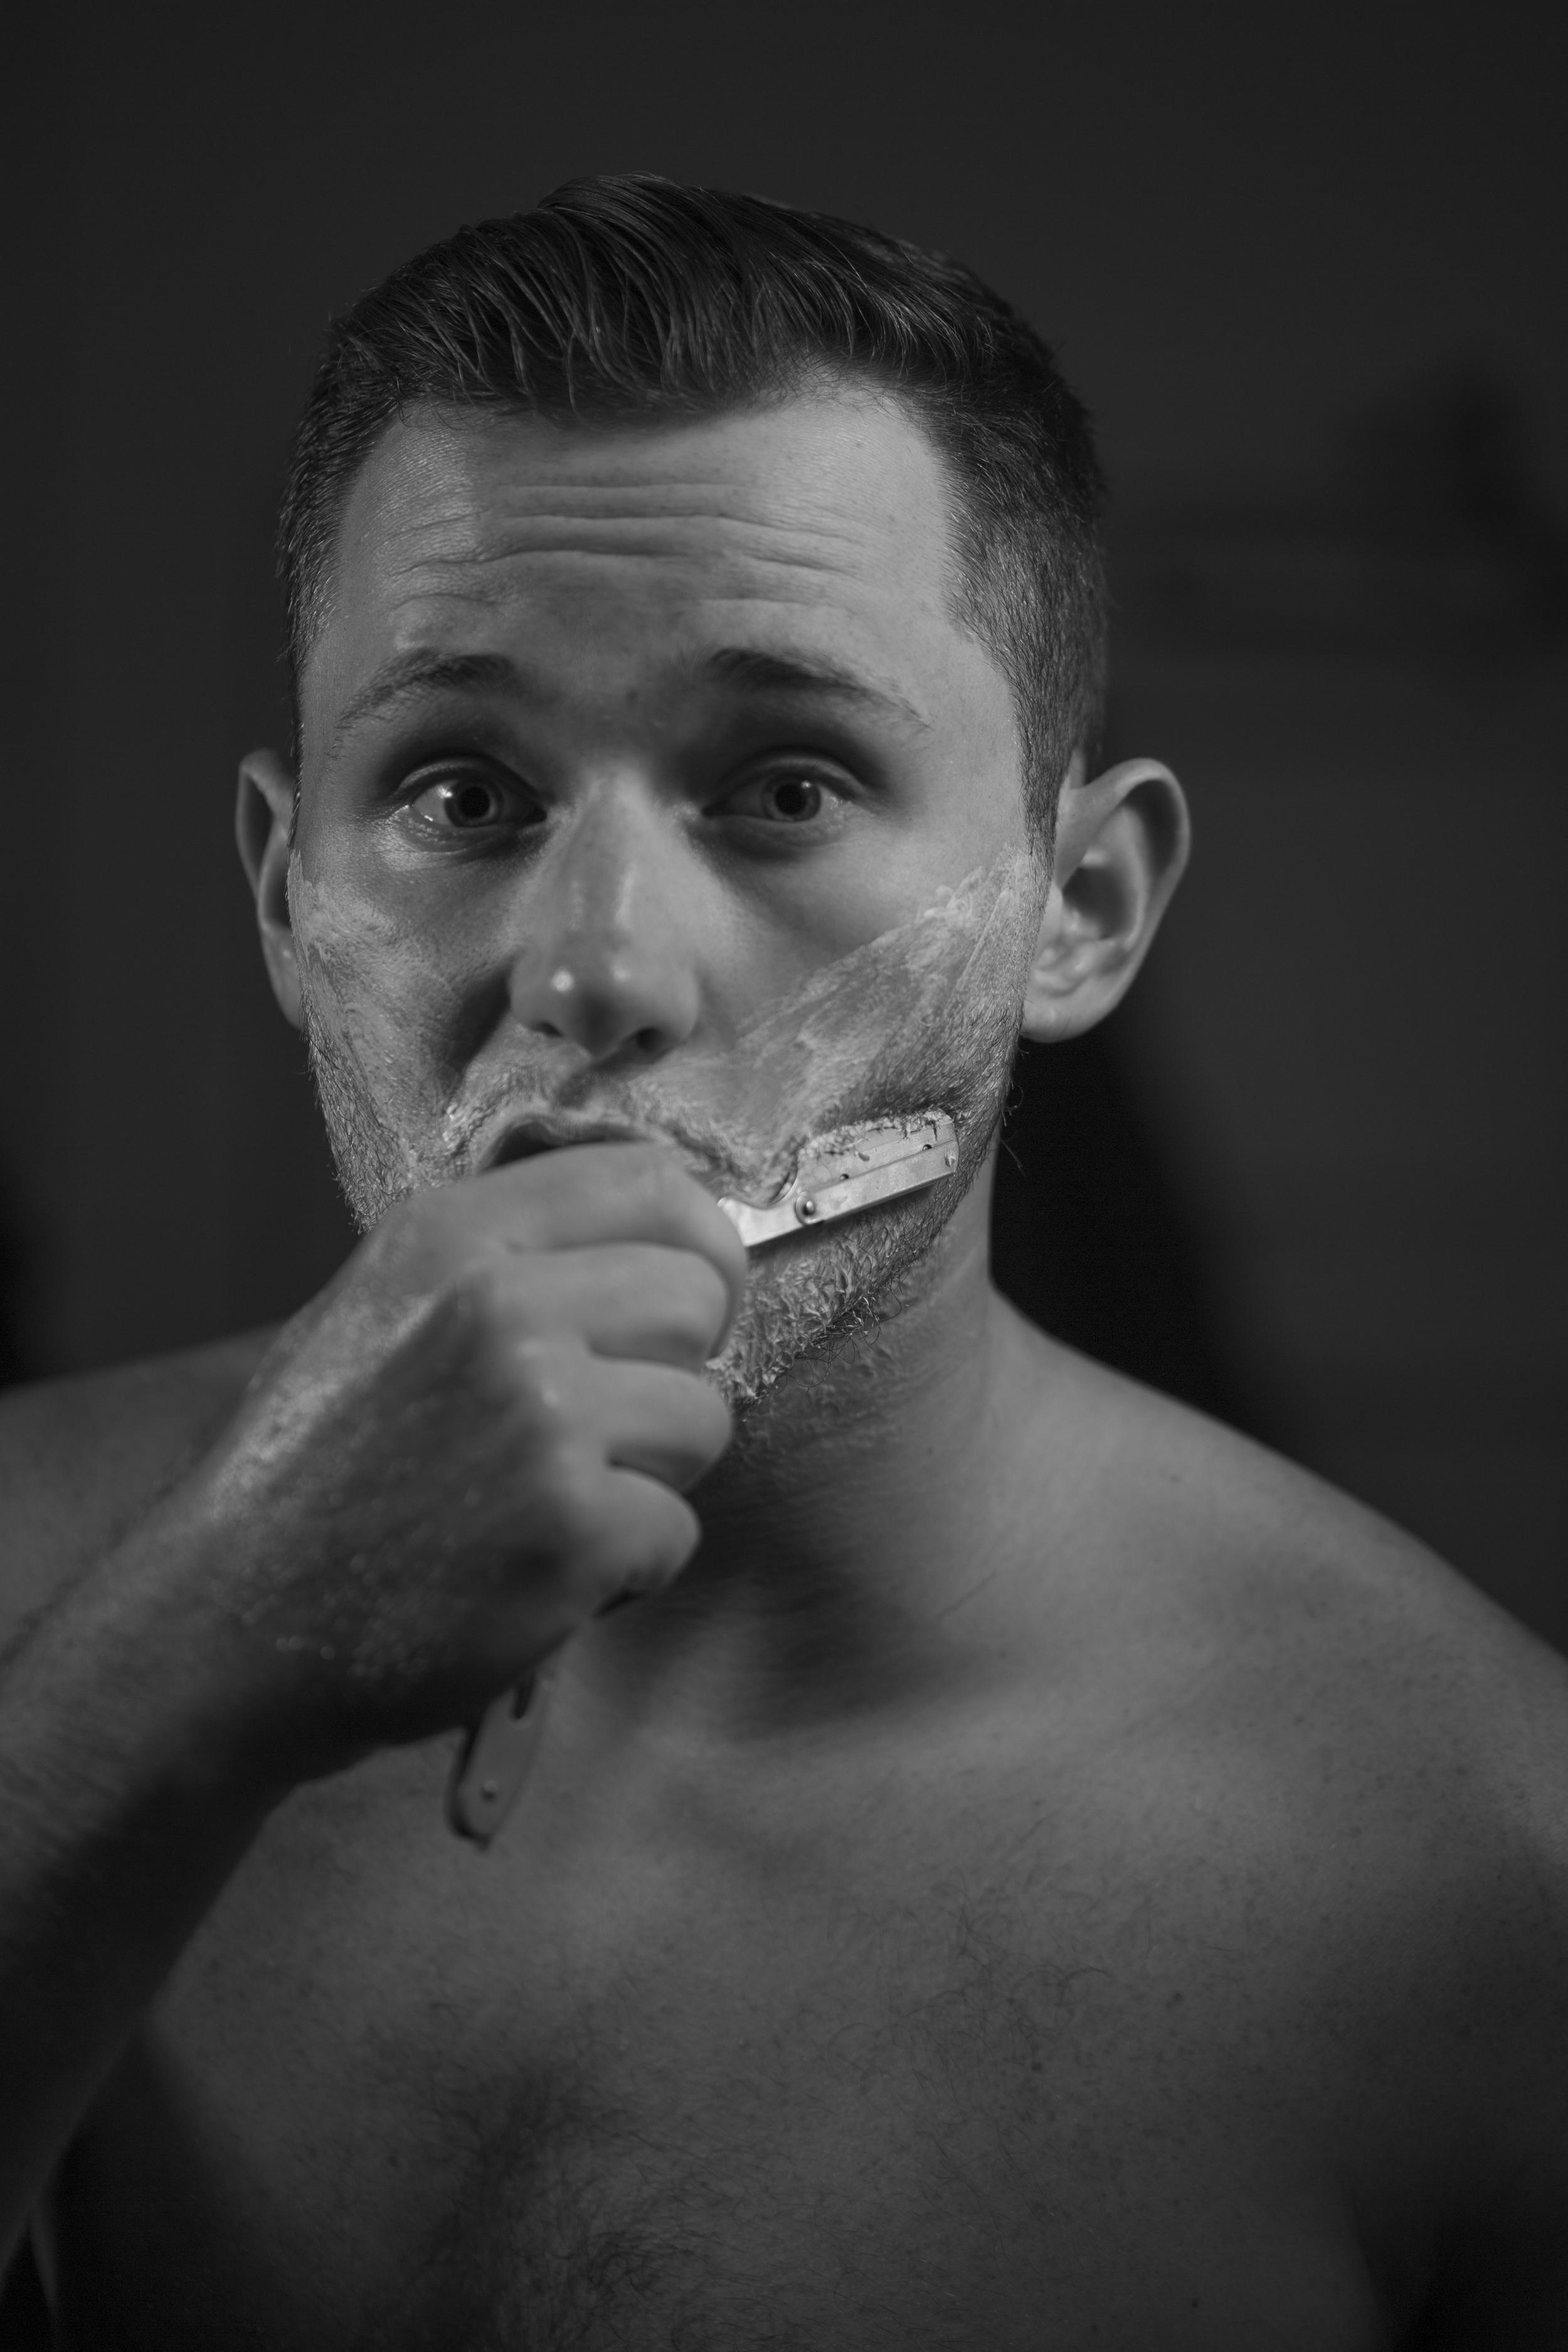 Shaving-082.jpg